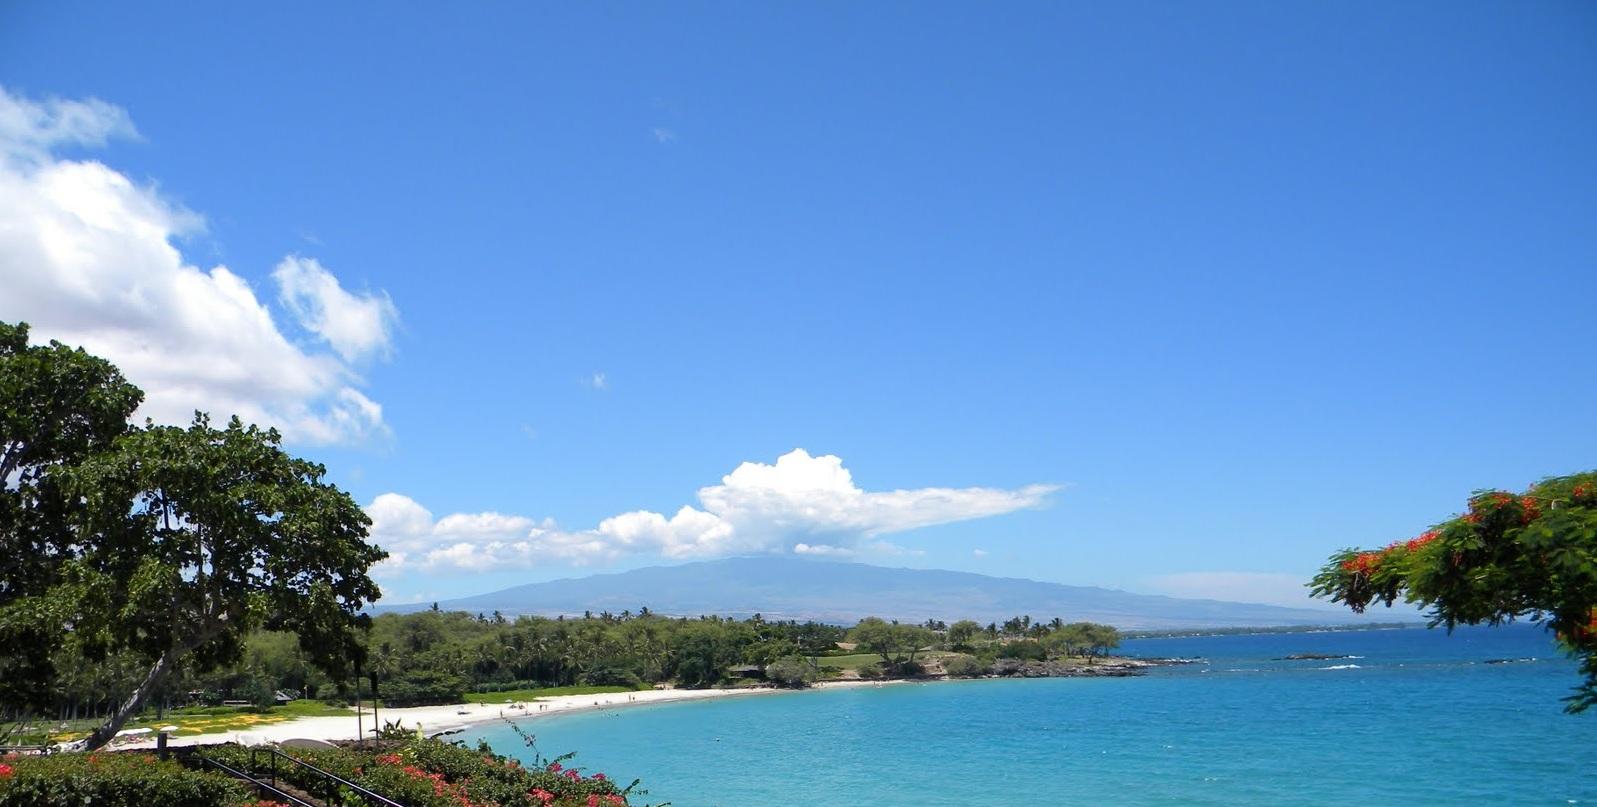 Beaches and Bikinis